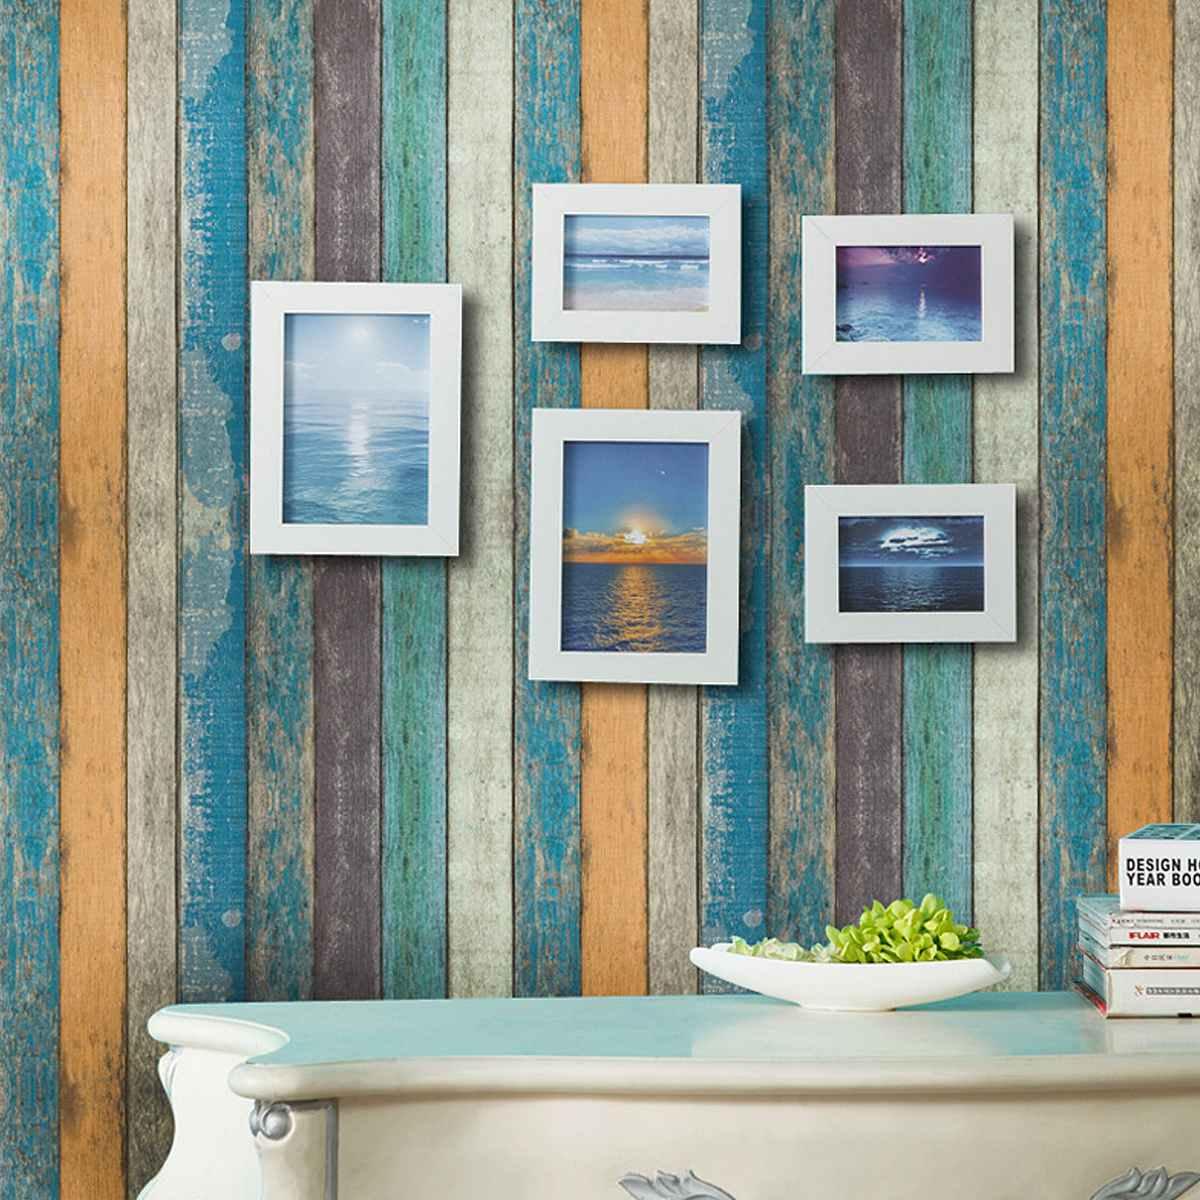 10m Wood Stick Peel 3D Wallpaper Realistic Retro Barnwood Rolls Textured Decor 393x18inch